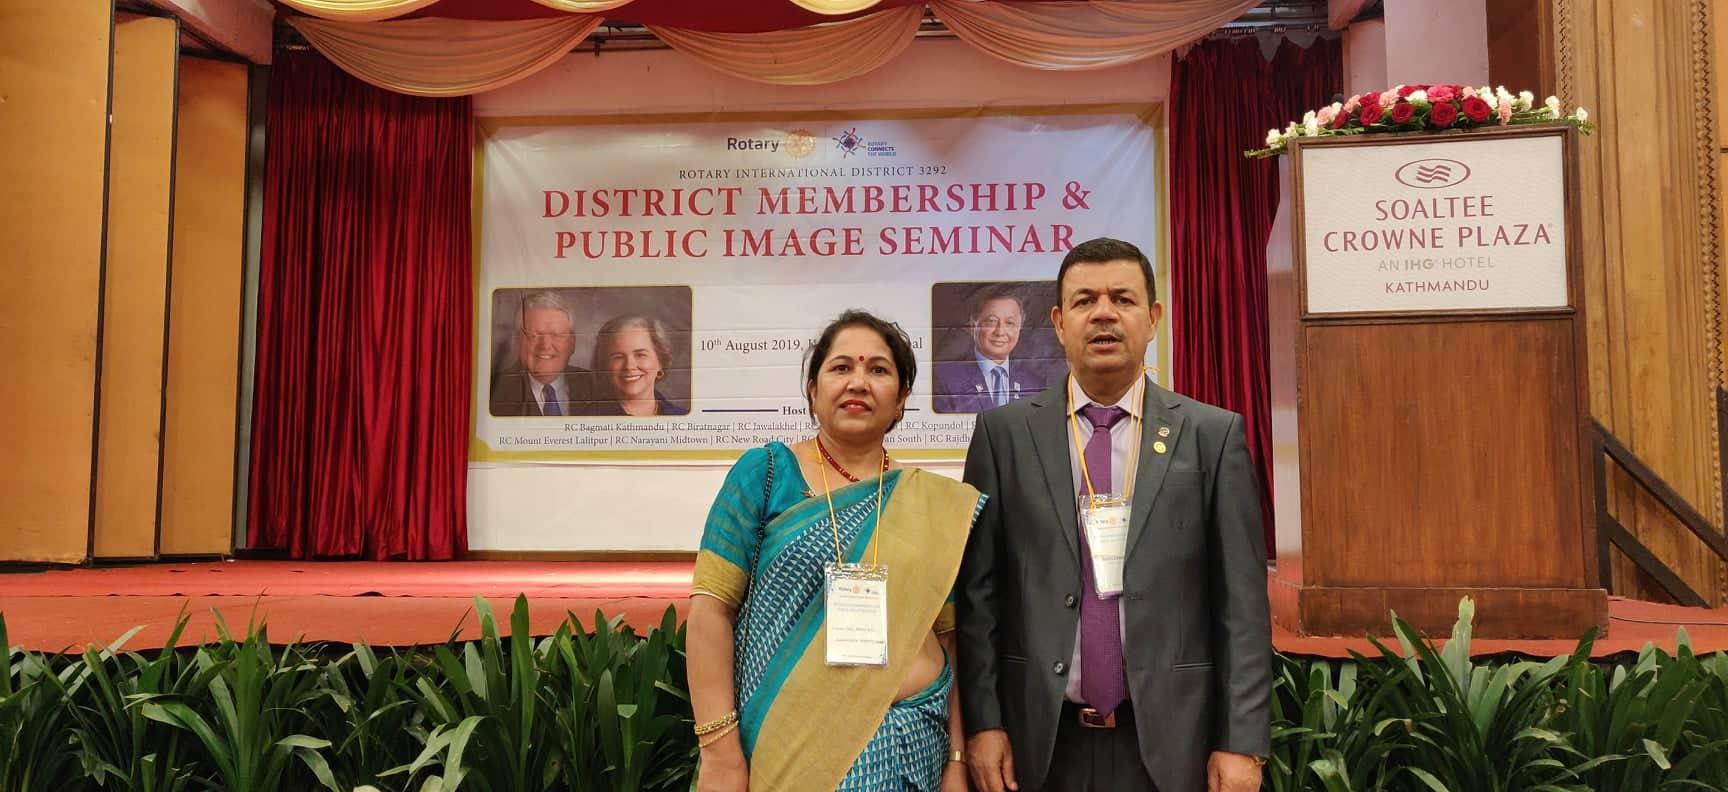 Attended-District-Membership-Public-Image-Seminar-2019-Rotary-Club-of-Kakarvitta-2